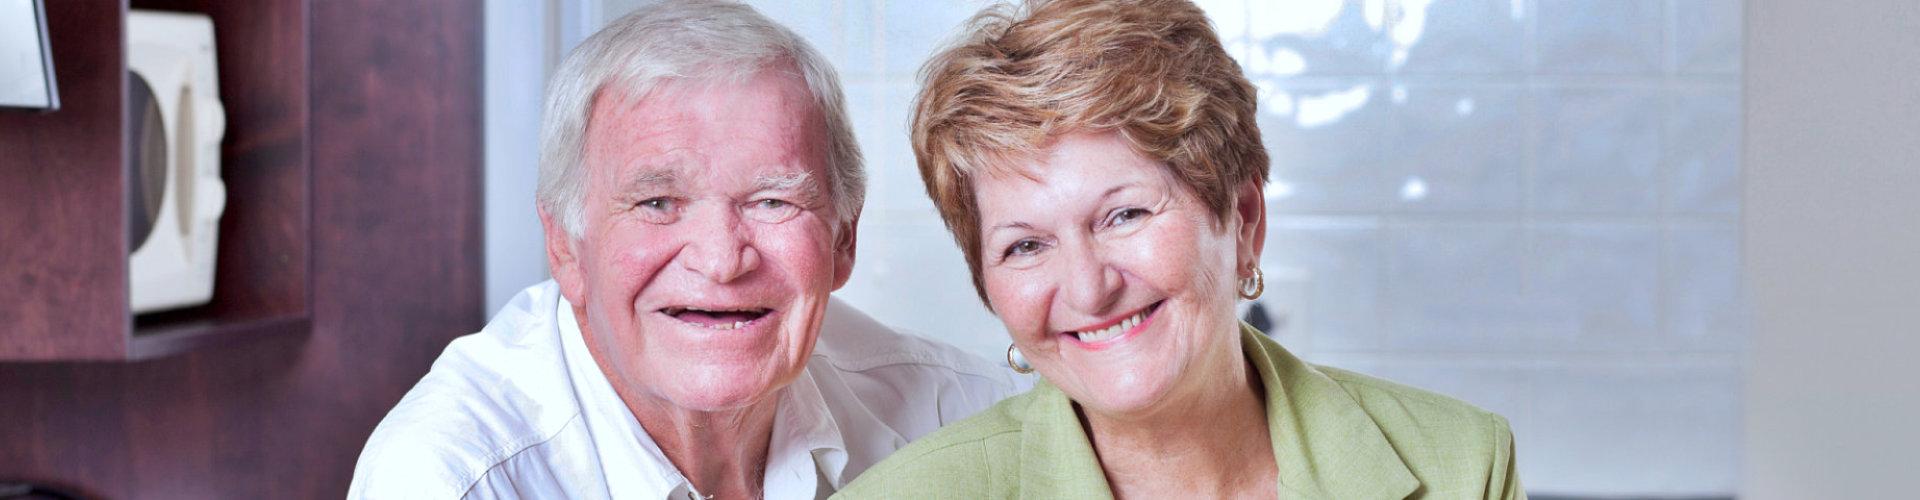 happy loving senior couple portrait at home